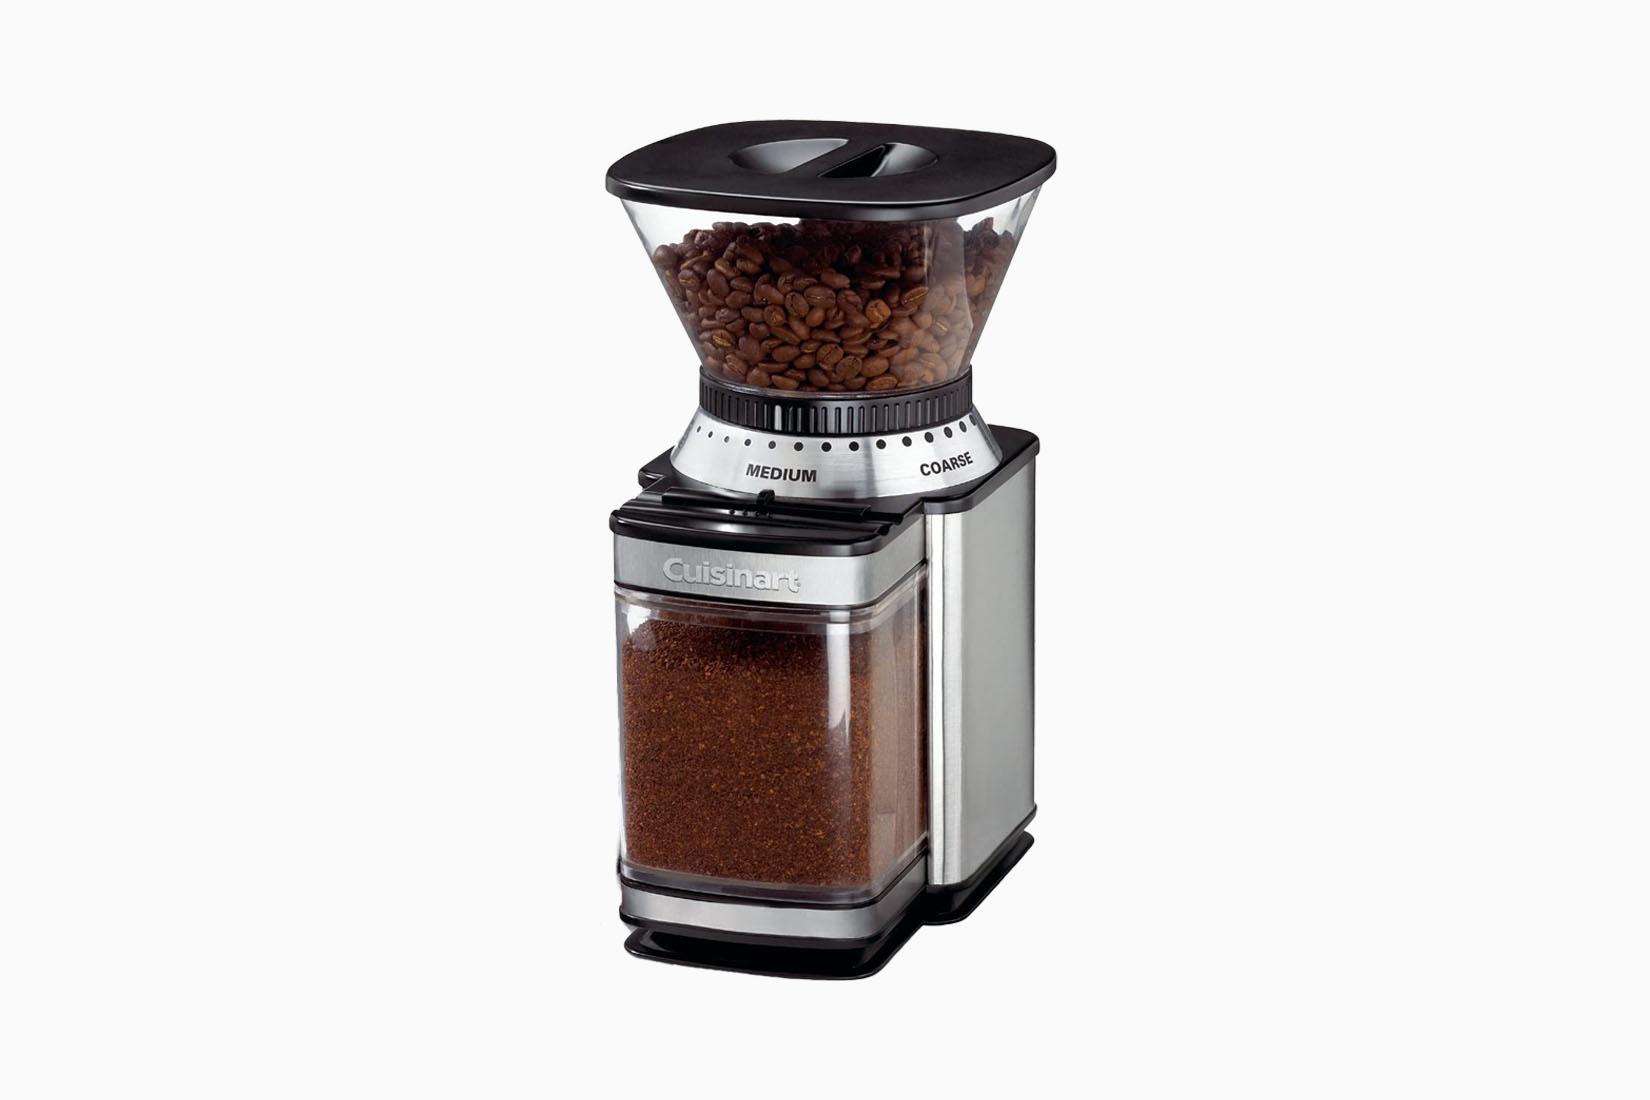 best drip coffee grinders cuisinart review Luxe Digital